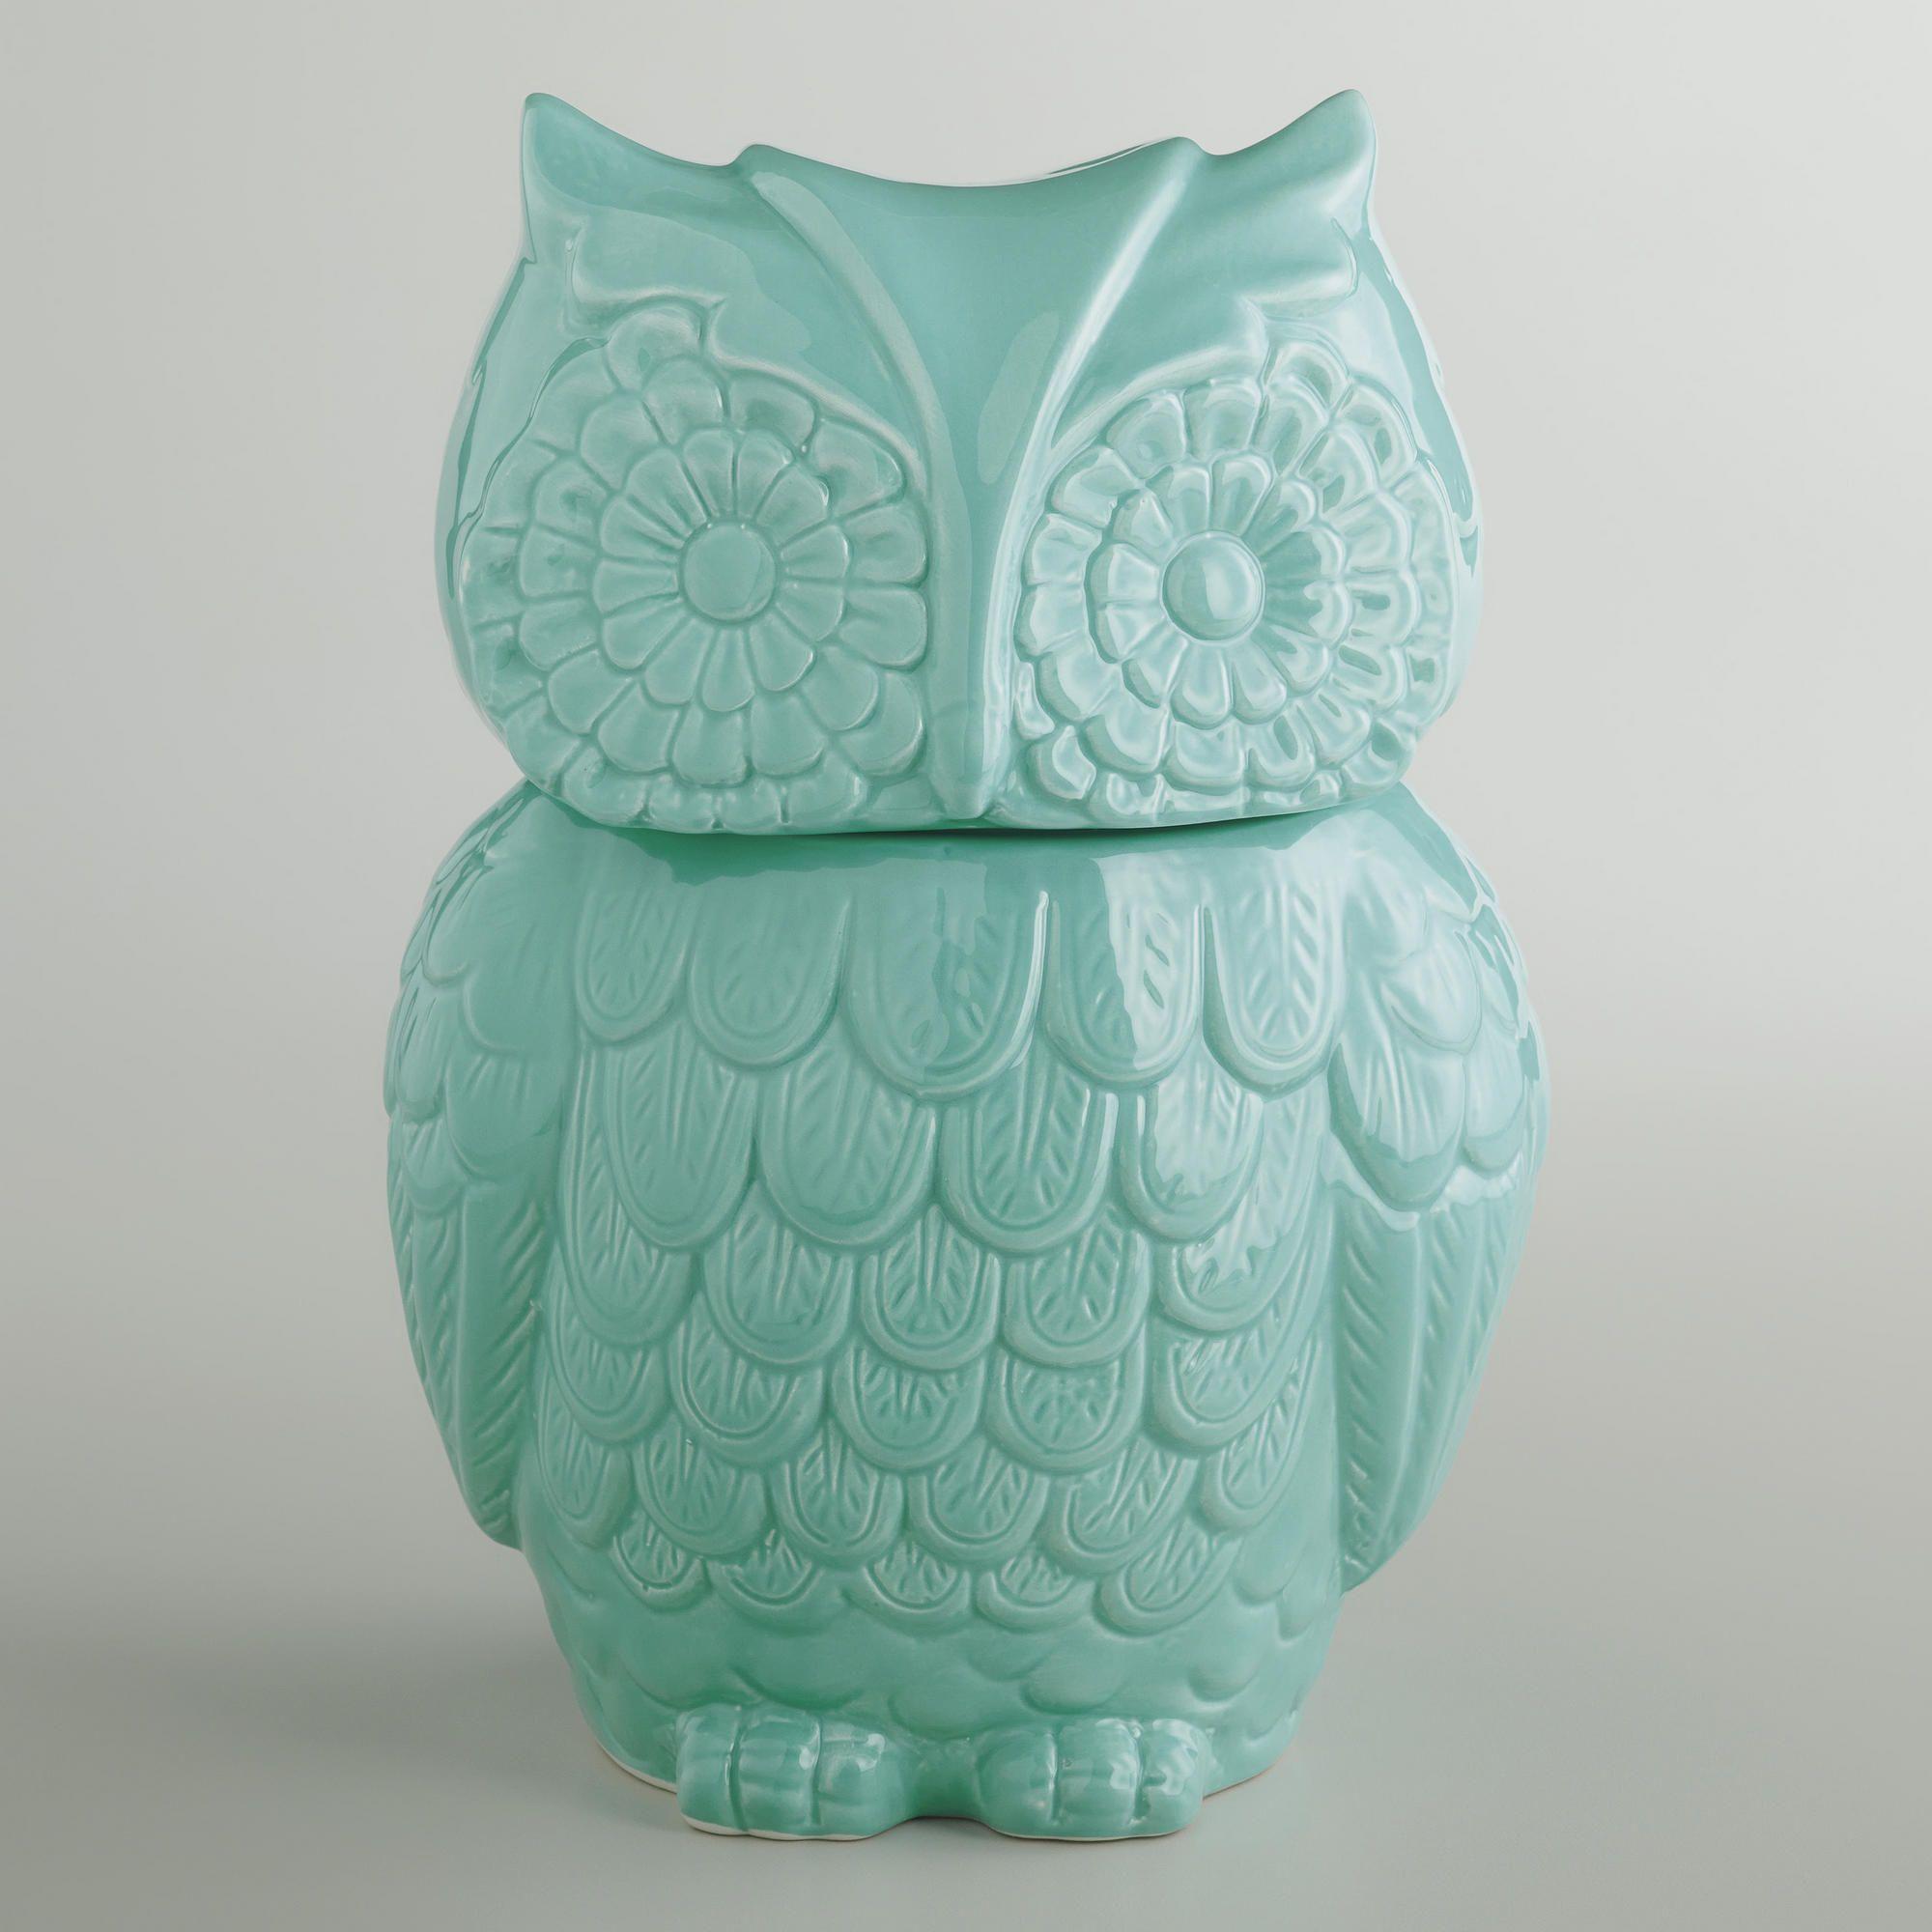 Aqua Owl Cookie Jar